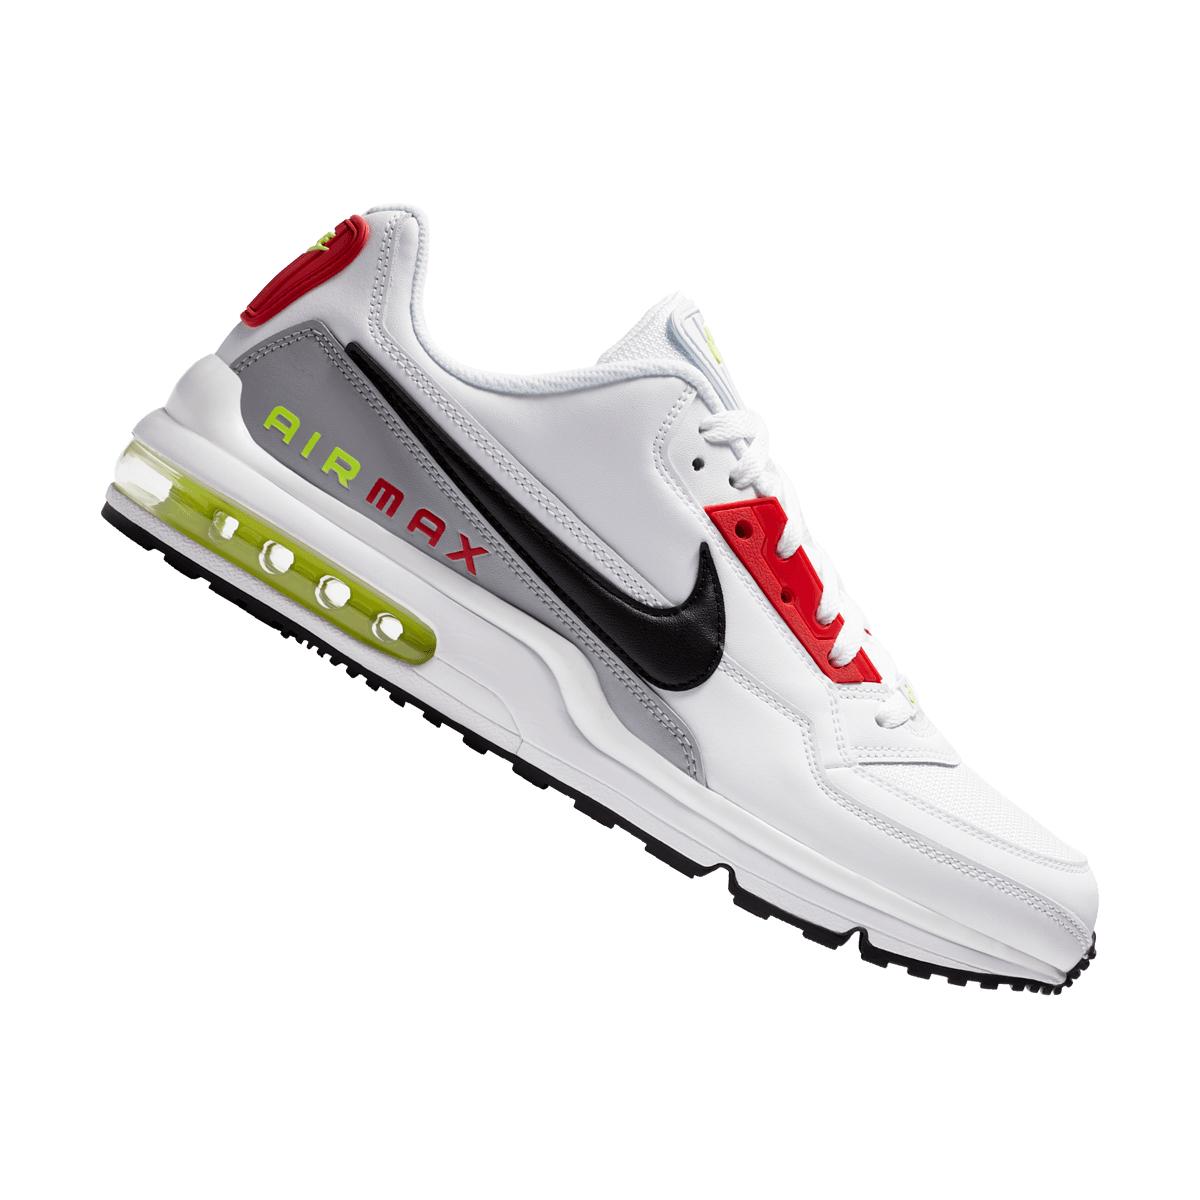 Nike Air Max LTD III sneakers